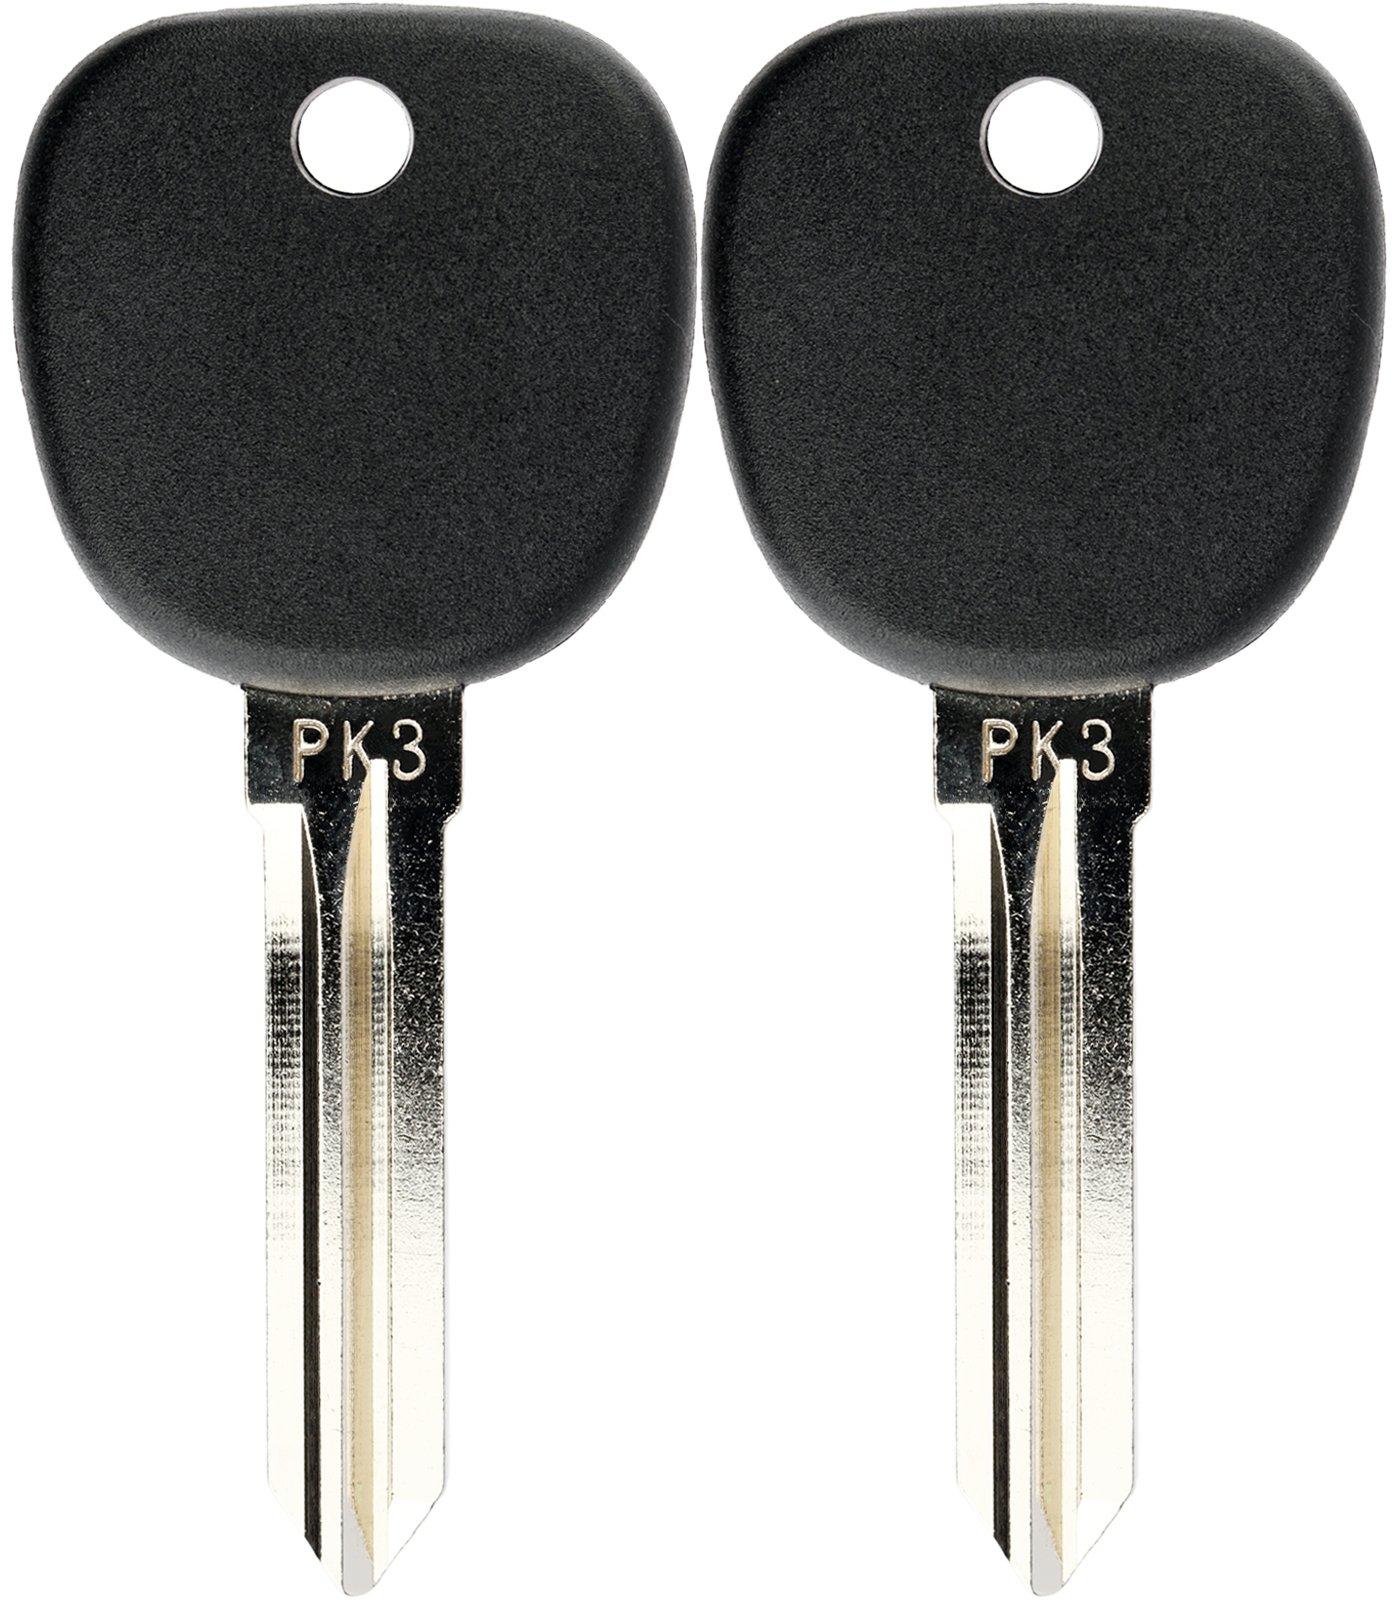 KeylessOption Transponder Chip Uncut Ignition Key Blank Replacement for Y164 LYSB01FWI4B9K-ELECTRNCS